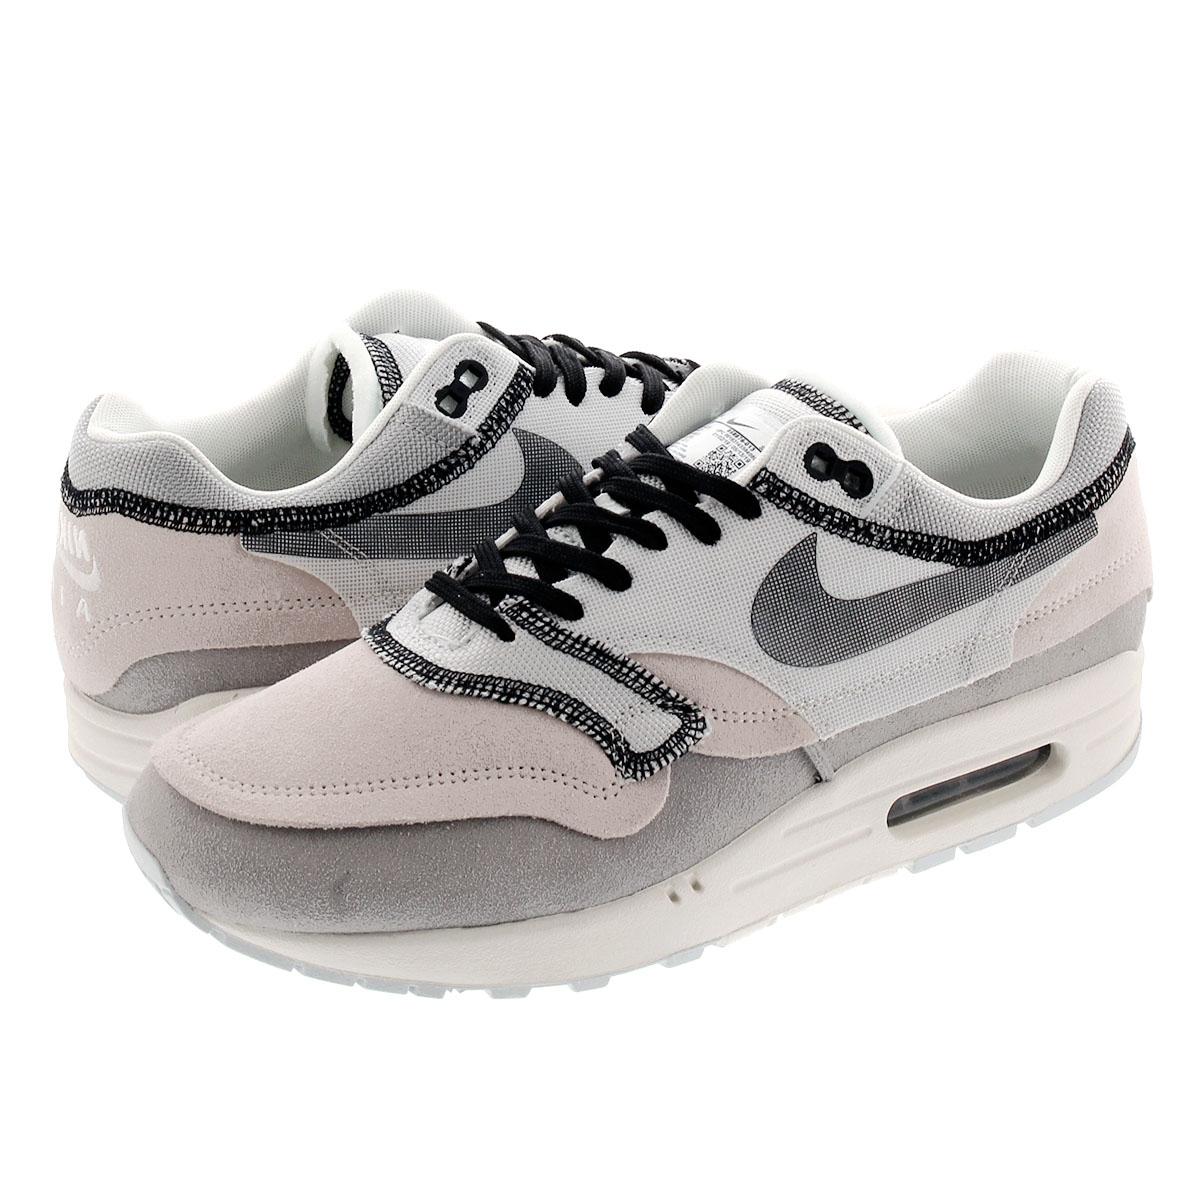 Nike Air Max 1 Premium Men's Shoes Shoes 60items